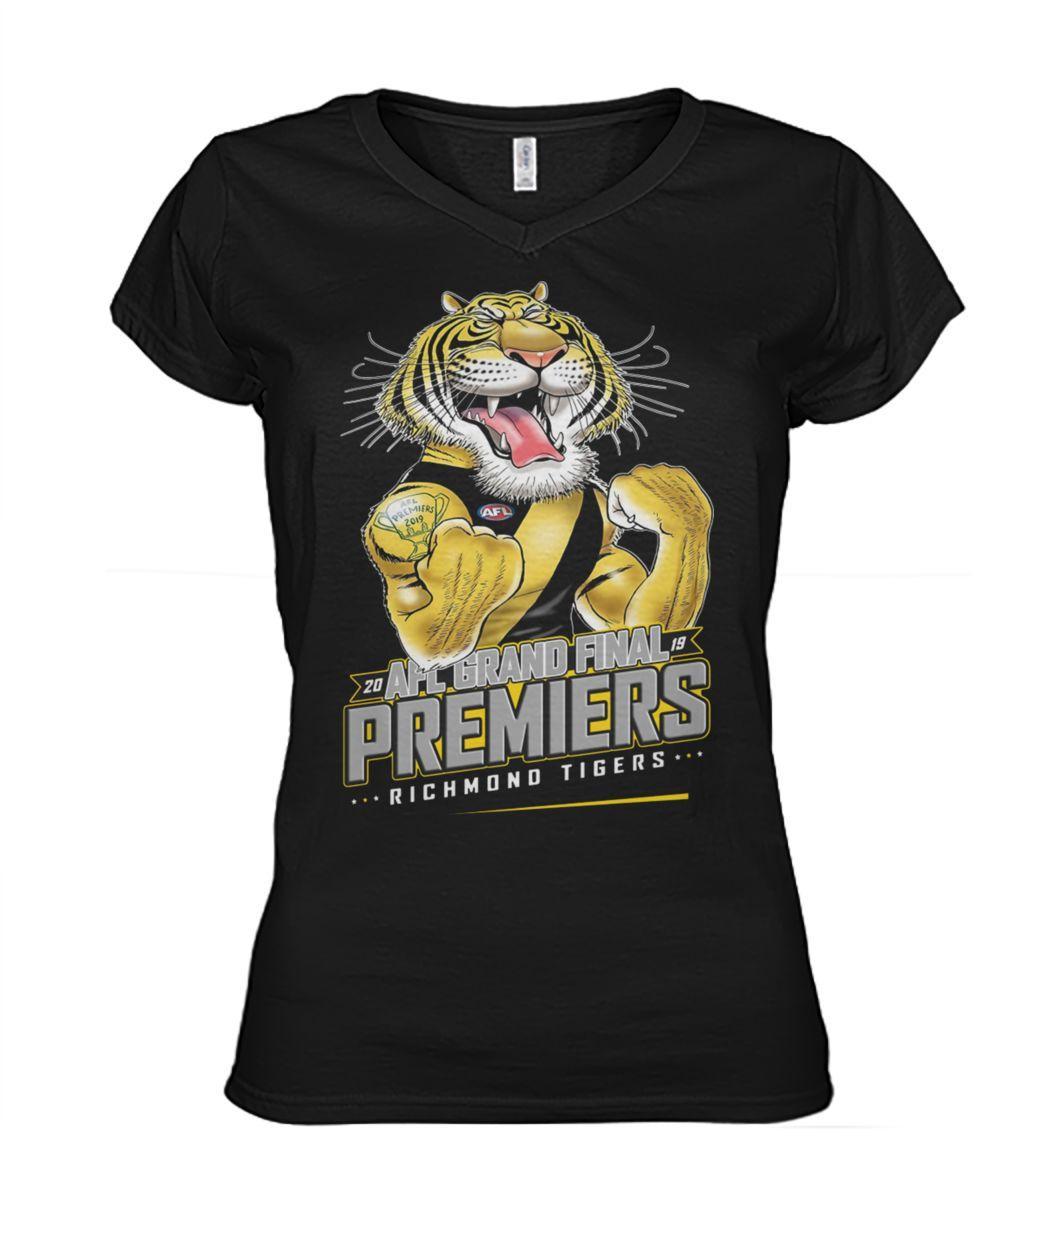 20 AFL grand final premiers richmond tigers women's v-neck